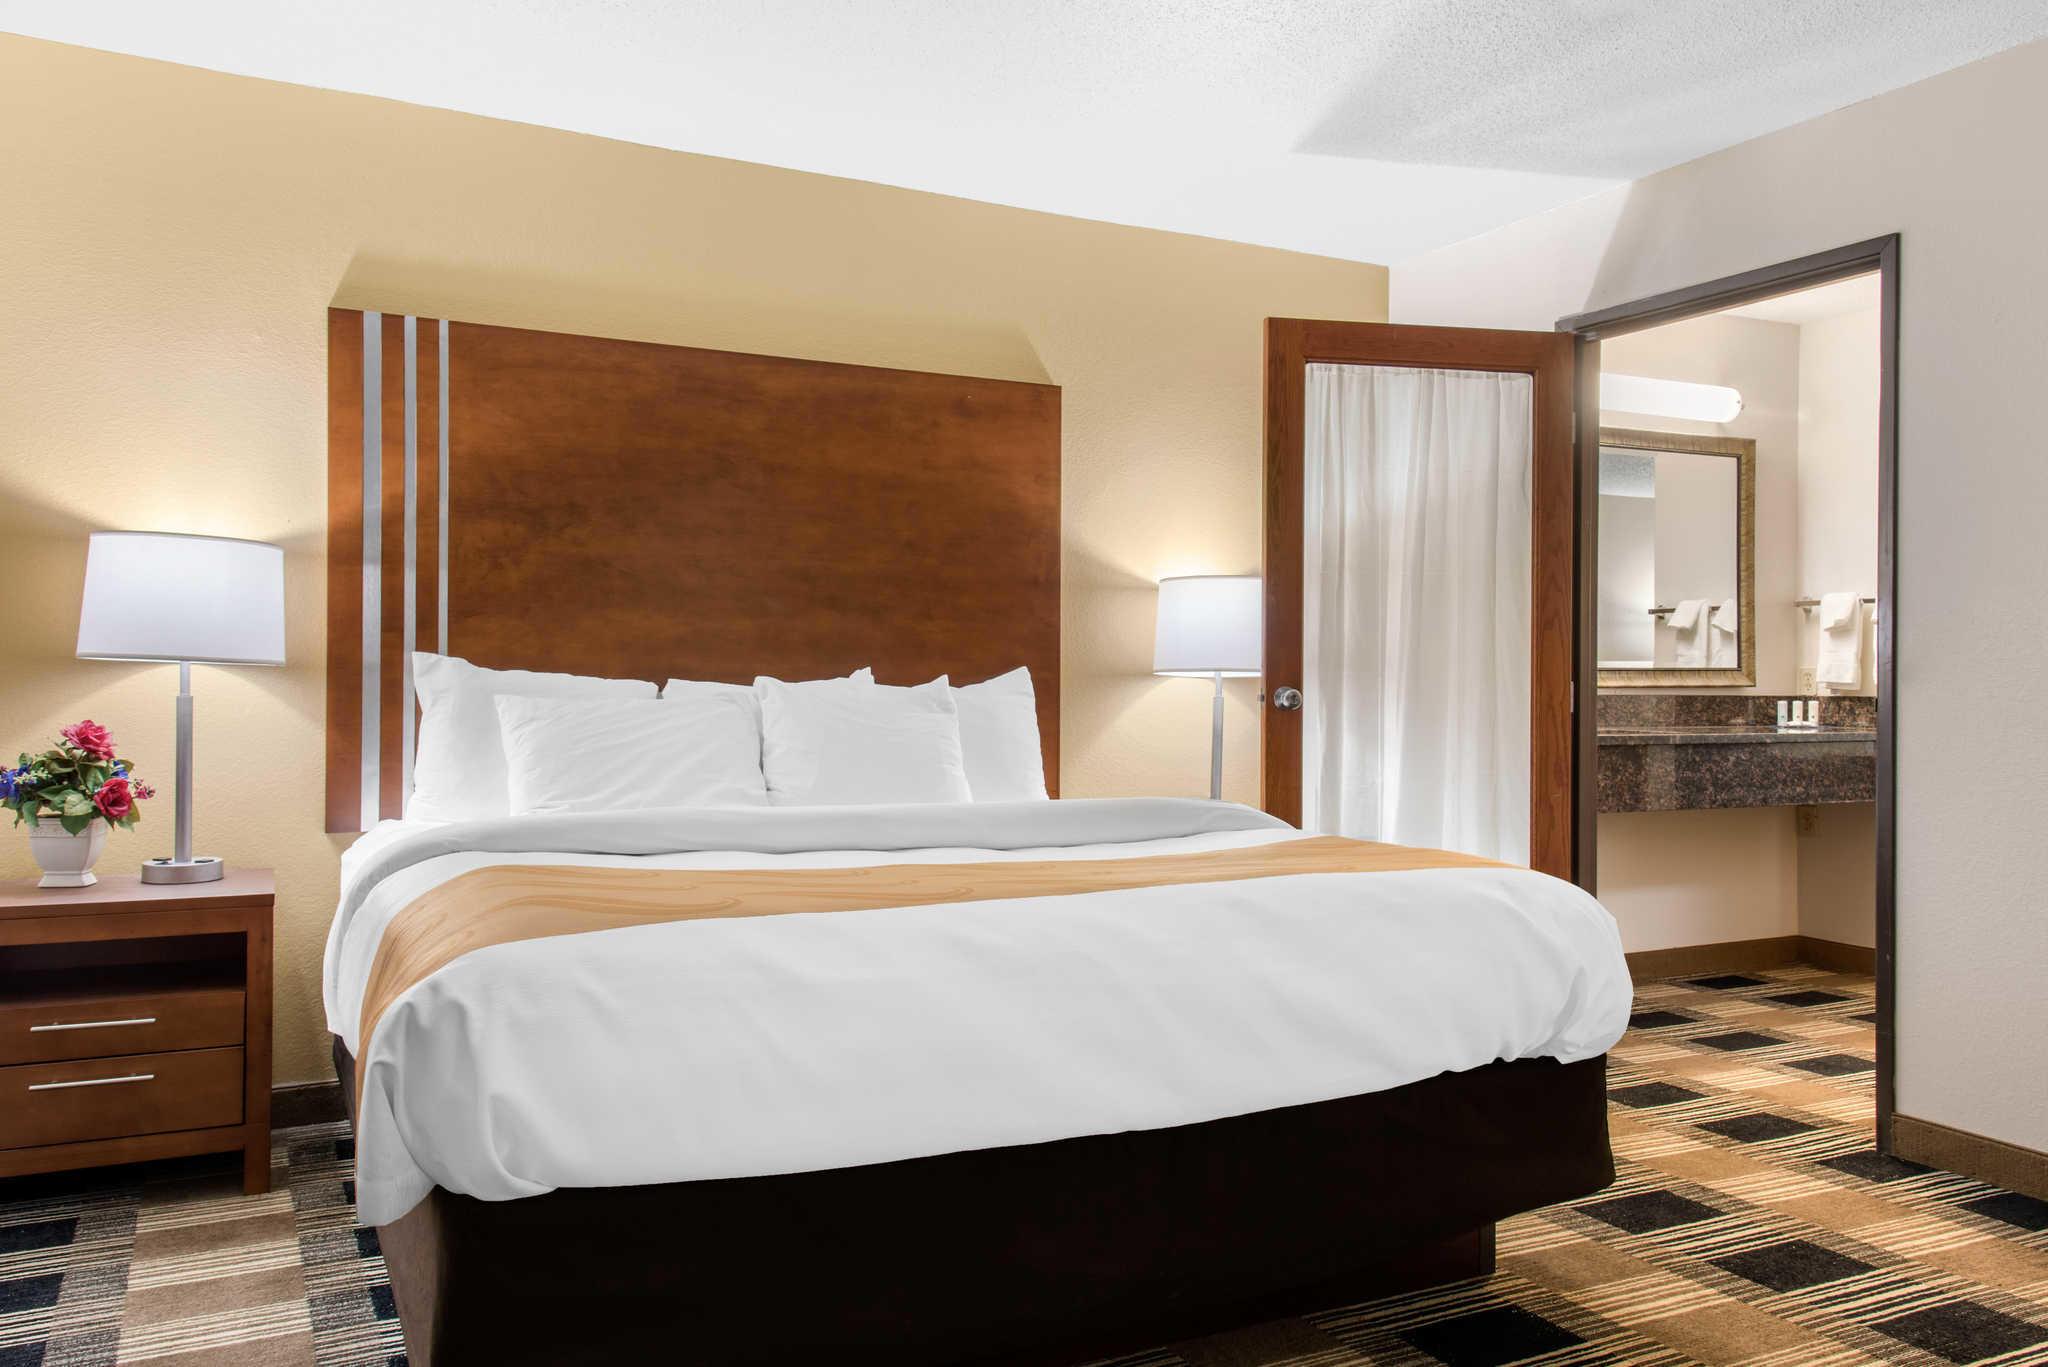 Quality Inn image 34